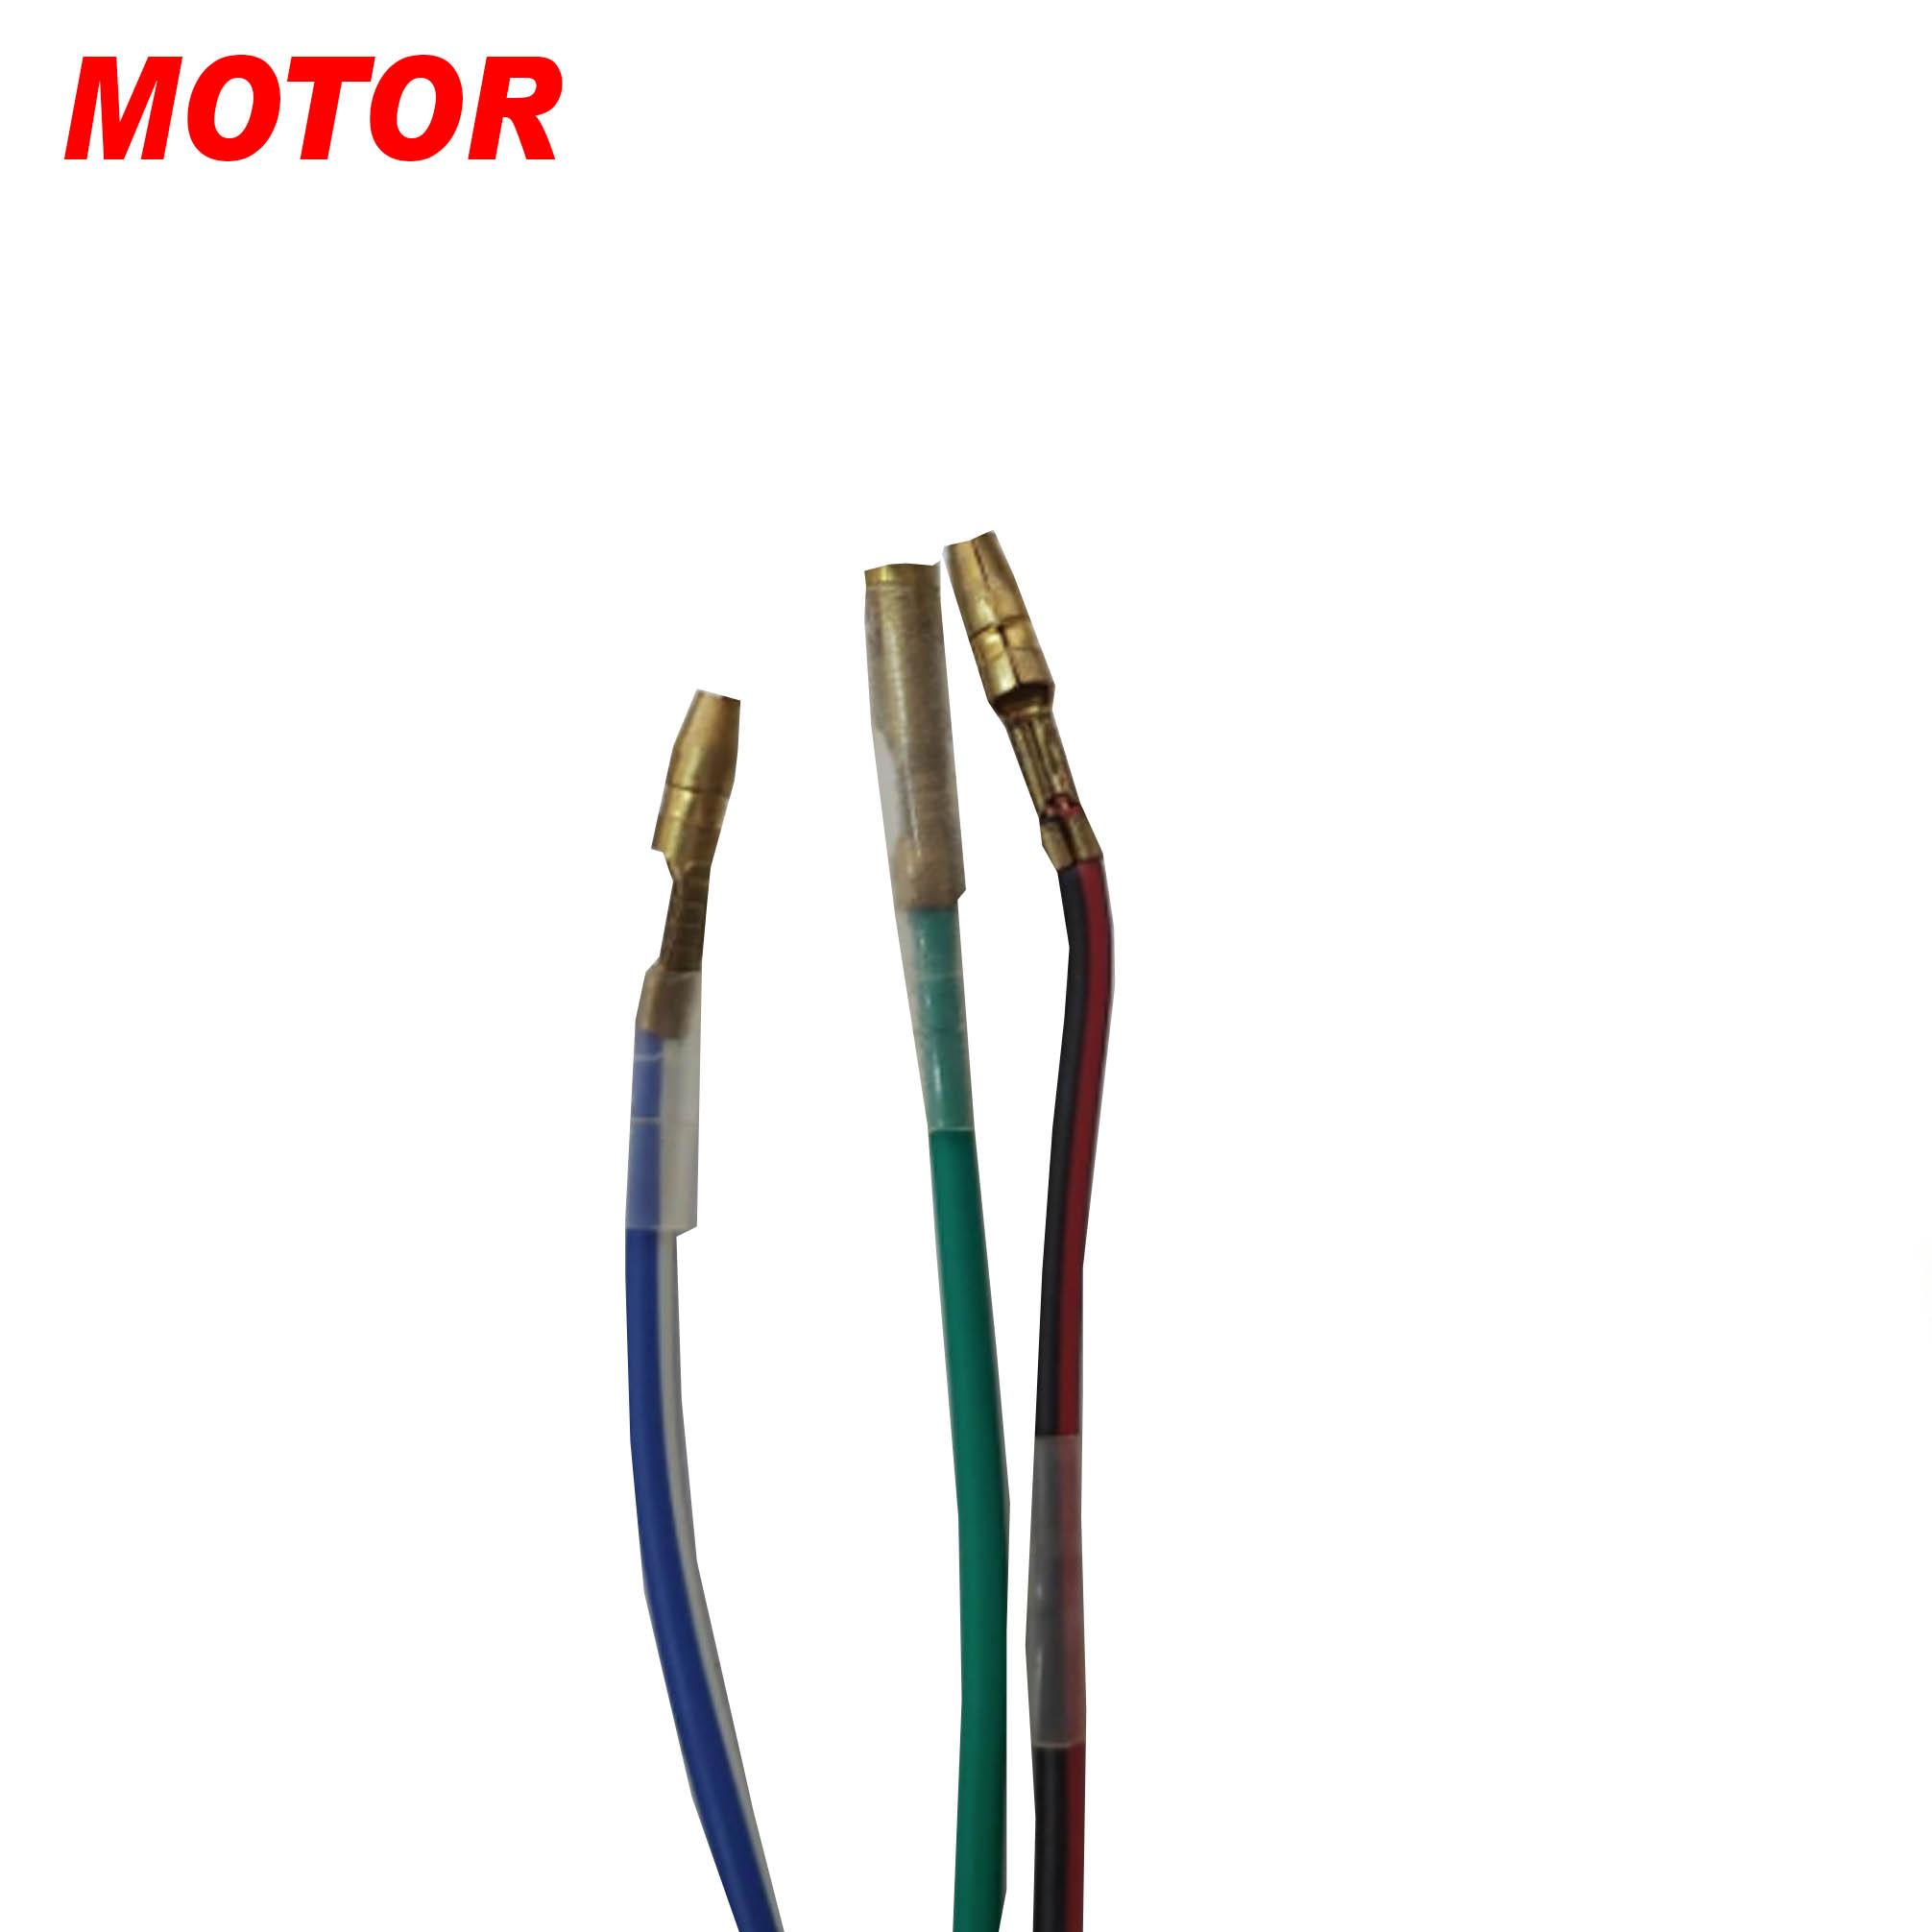 MOTOR-2.jpg